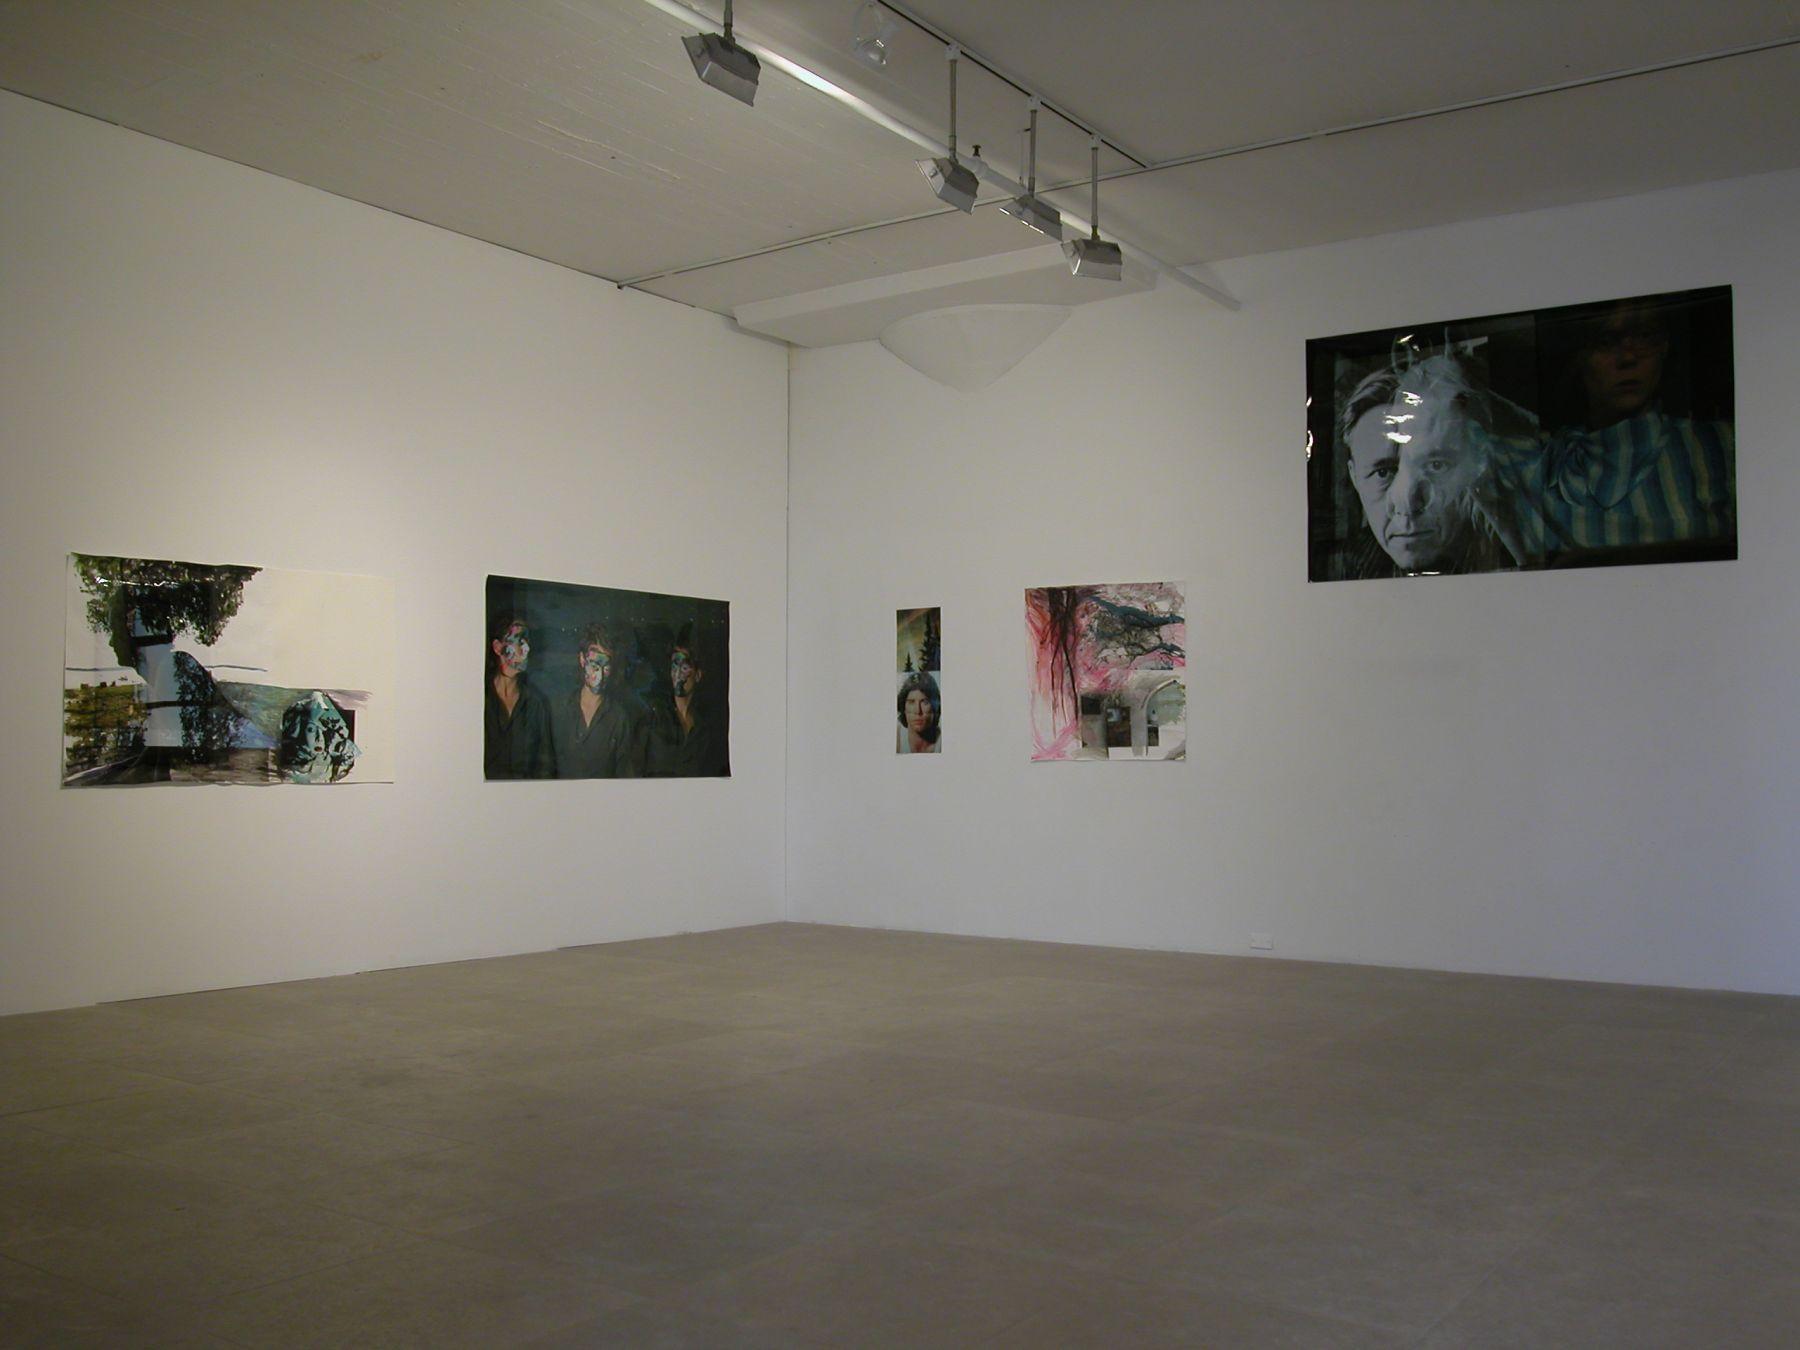 Installation view, Greene Naftali, New York, 2004